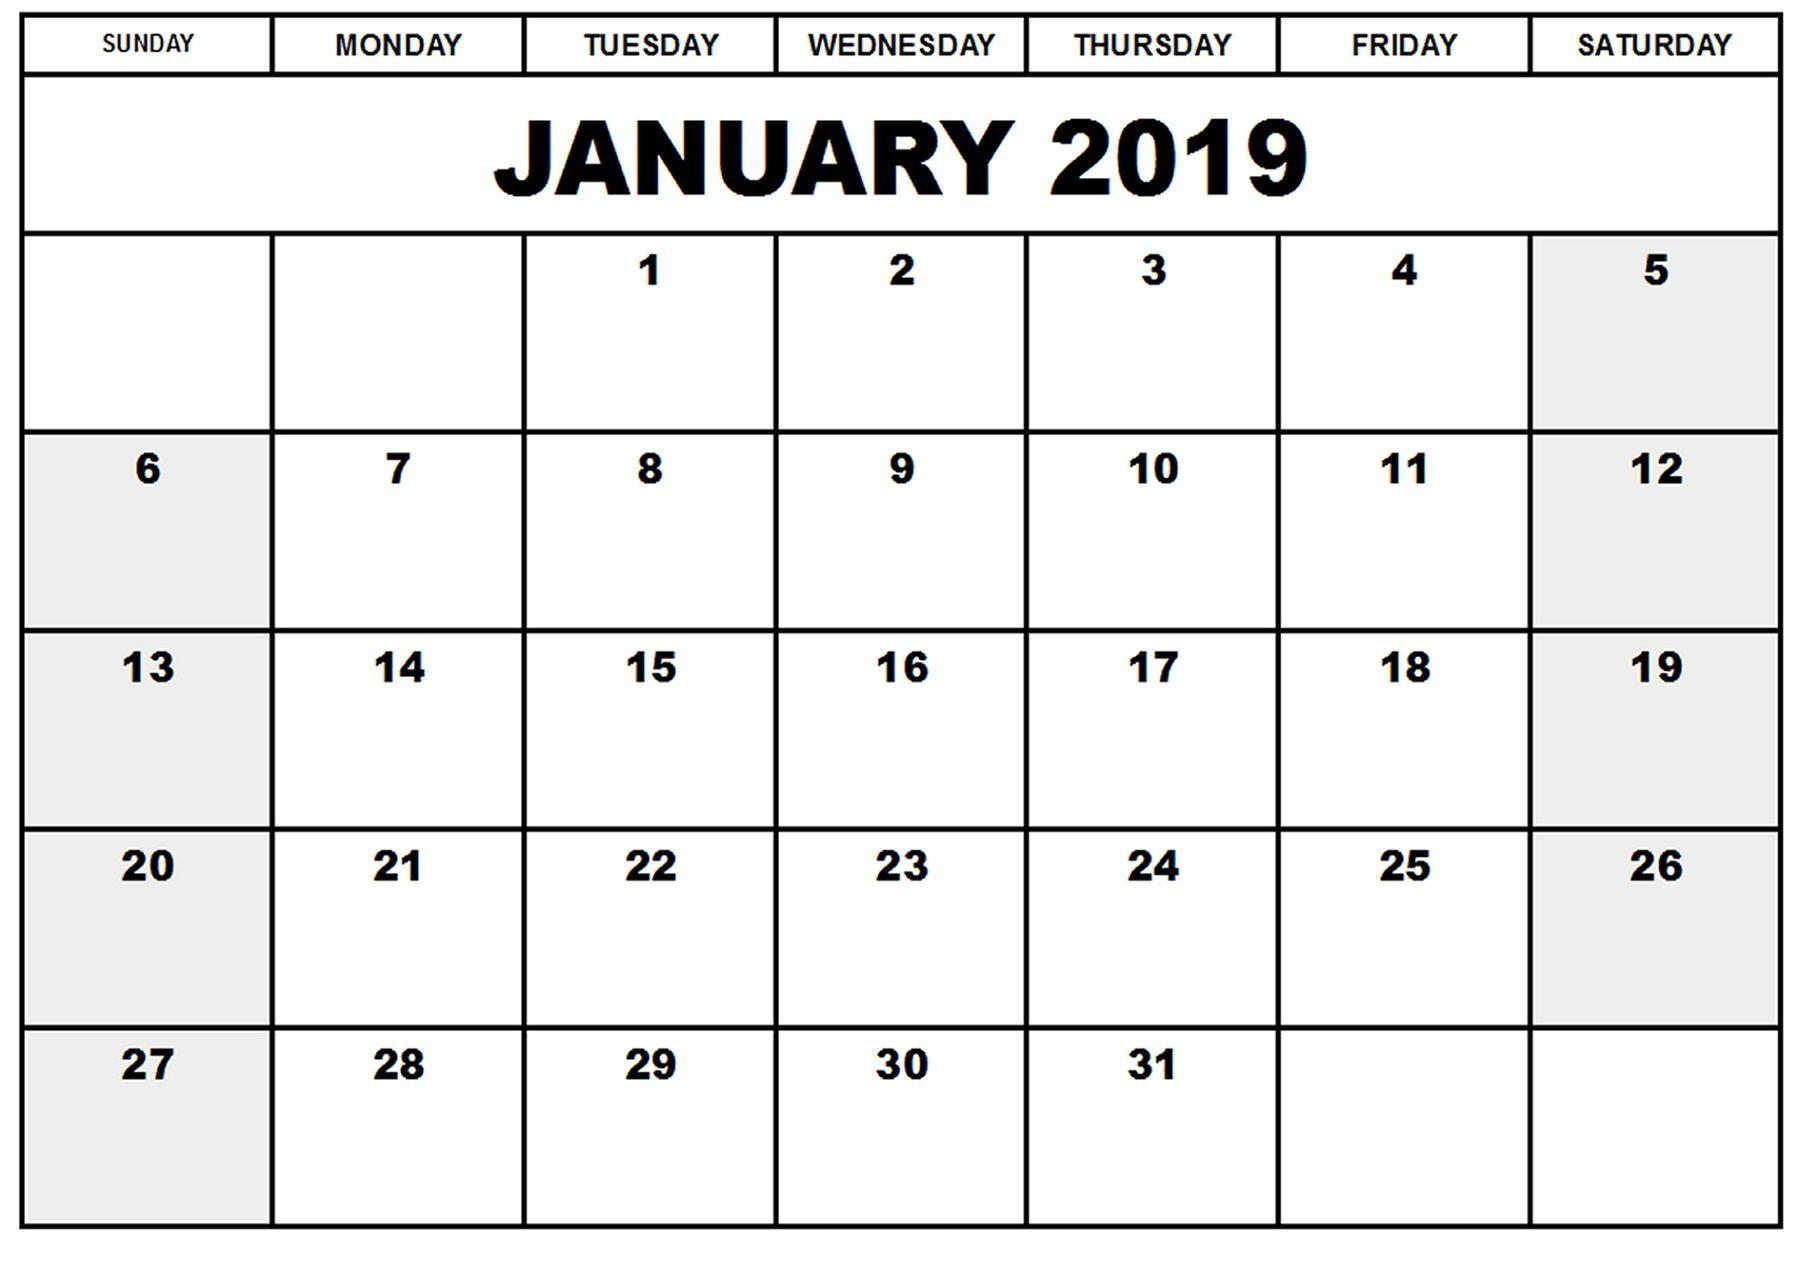 Blank Printable Calendar January 2019 | Printableshelter